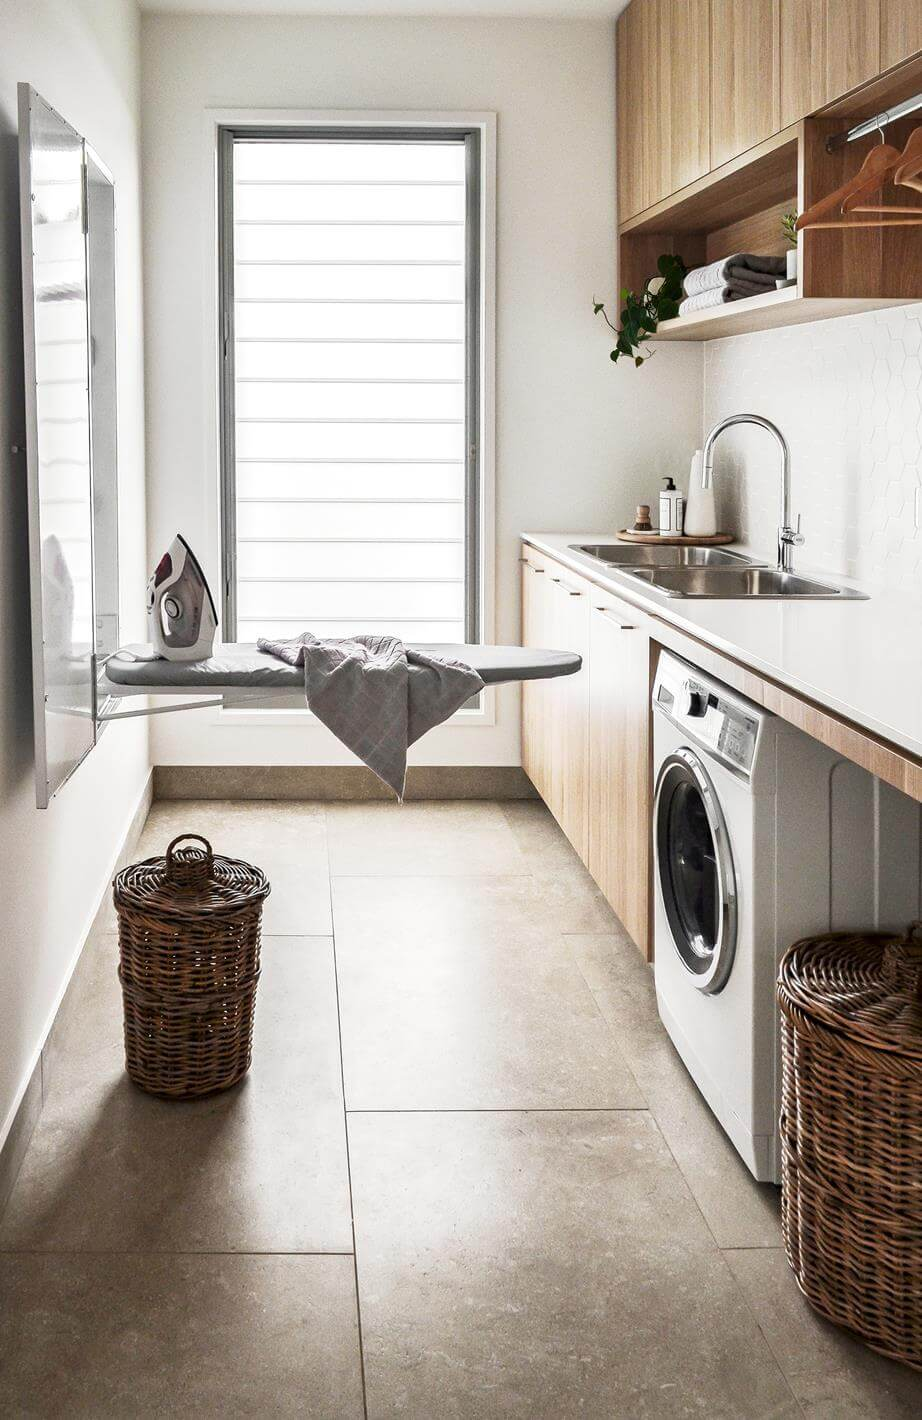 45 Lovely Laundry Ideas Small Laundry Design Storage Organisation